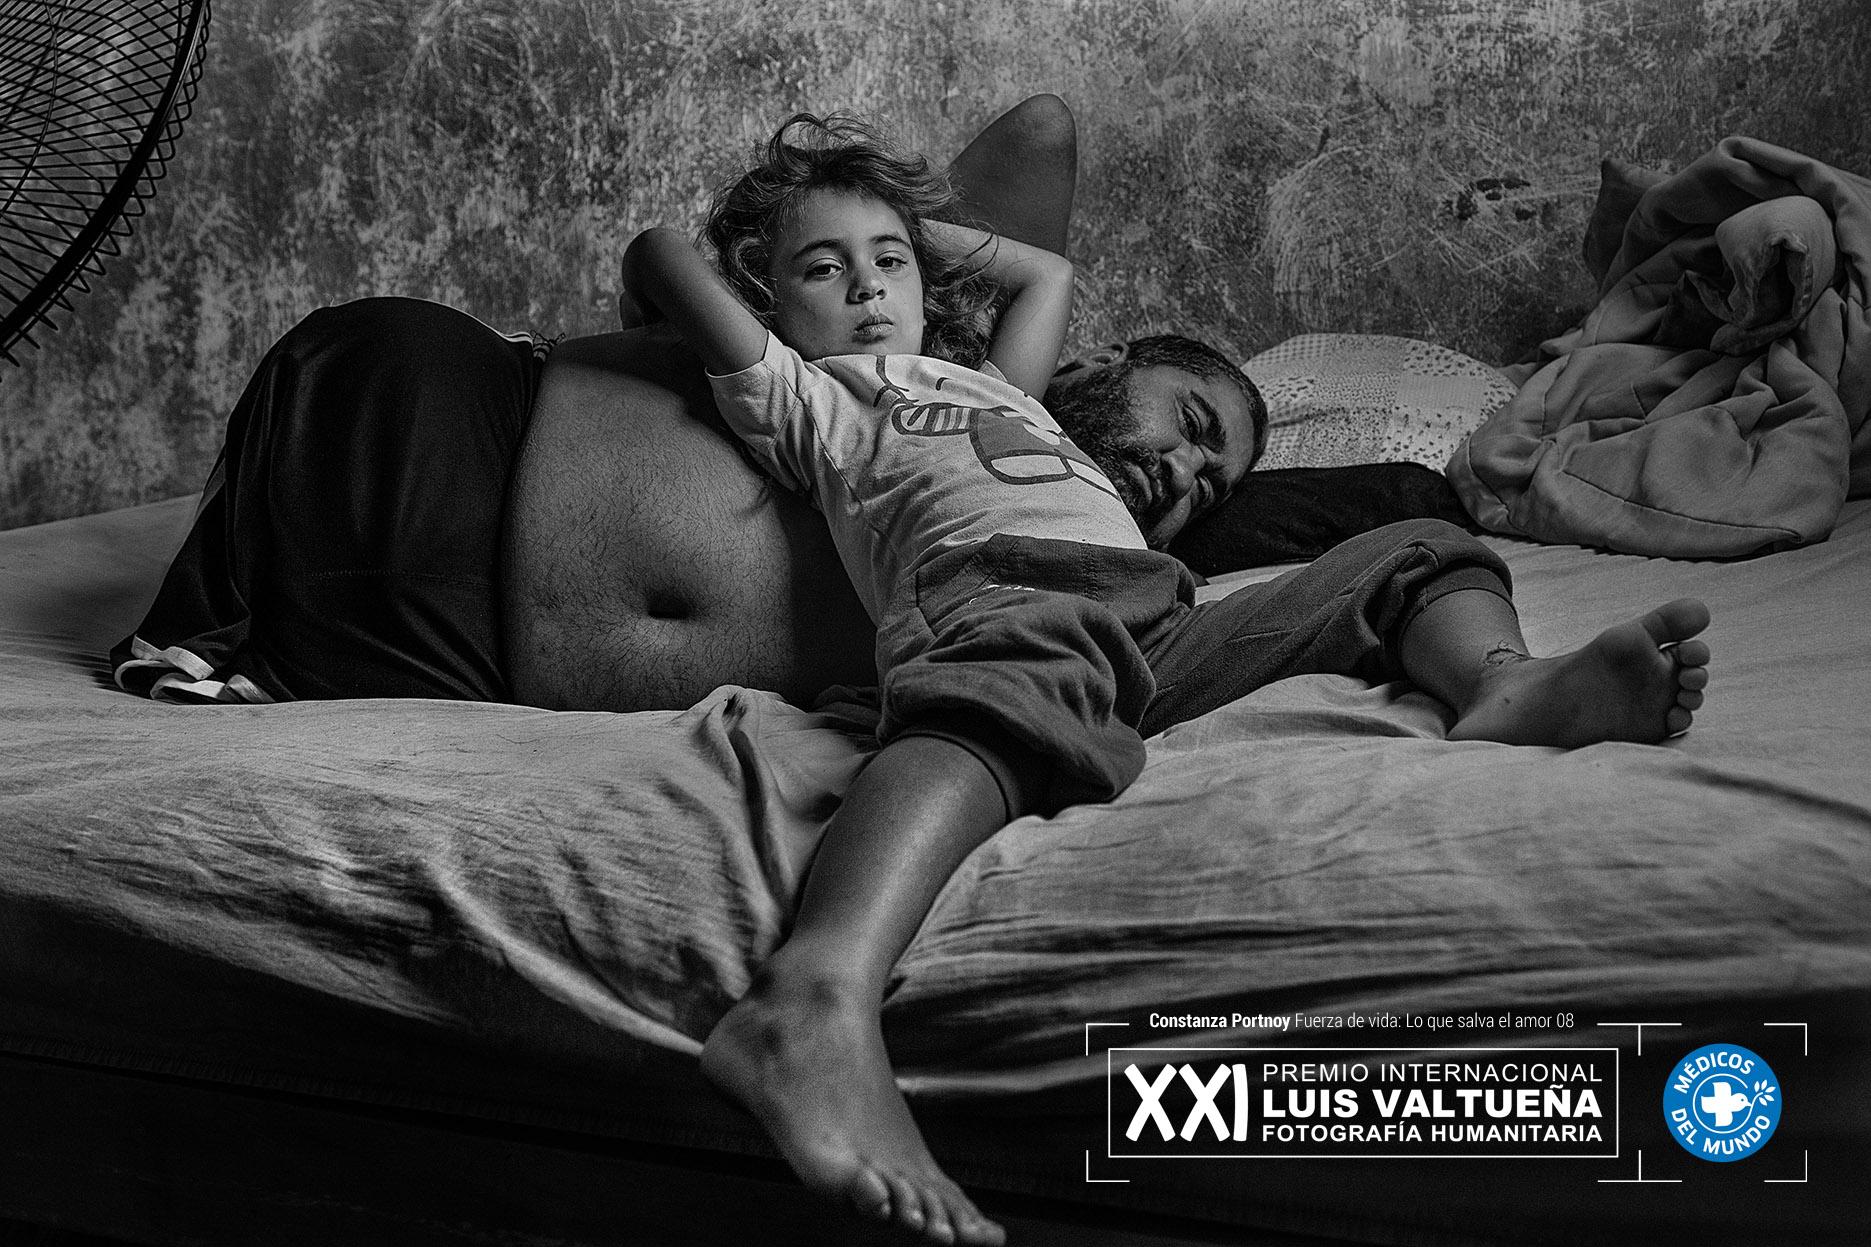 Luis Valtueña International Humanitarian Photography Award 2018 (up to 6,000 Euros)